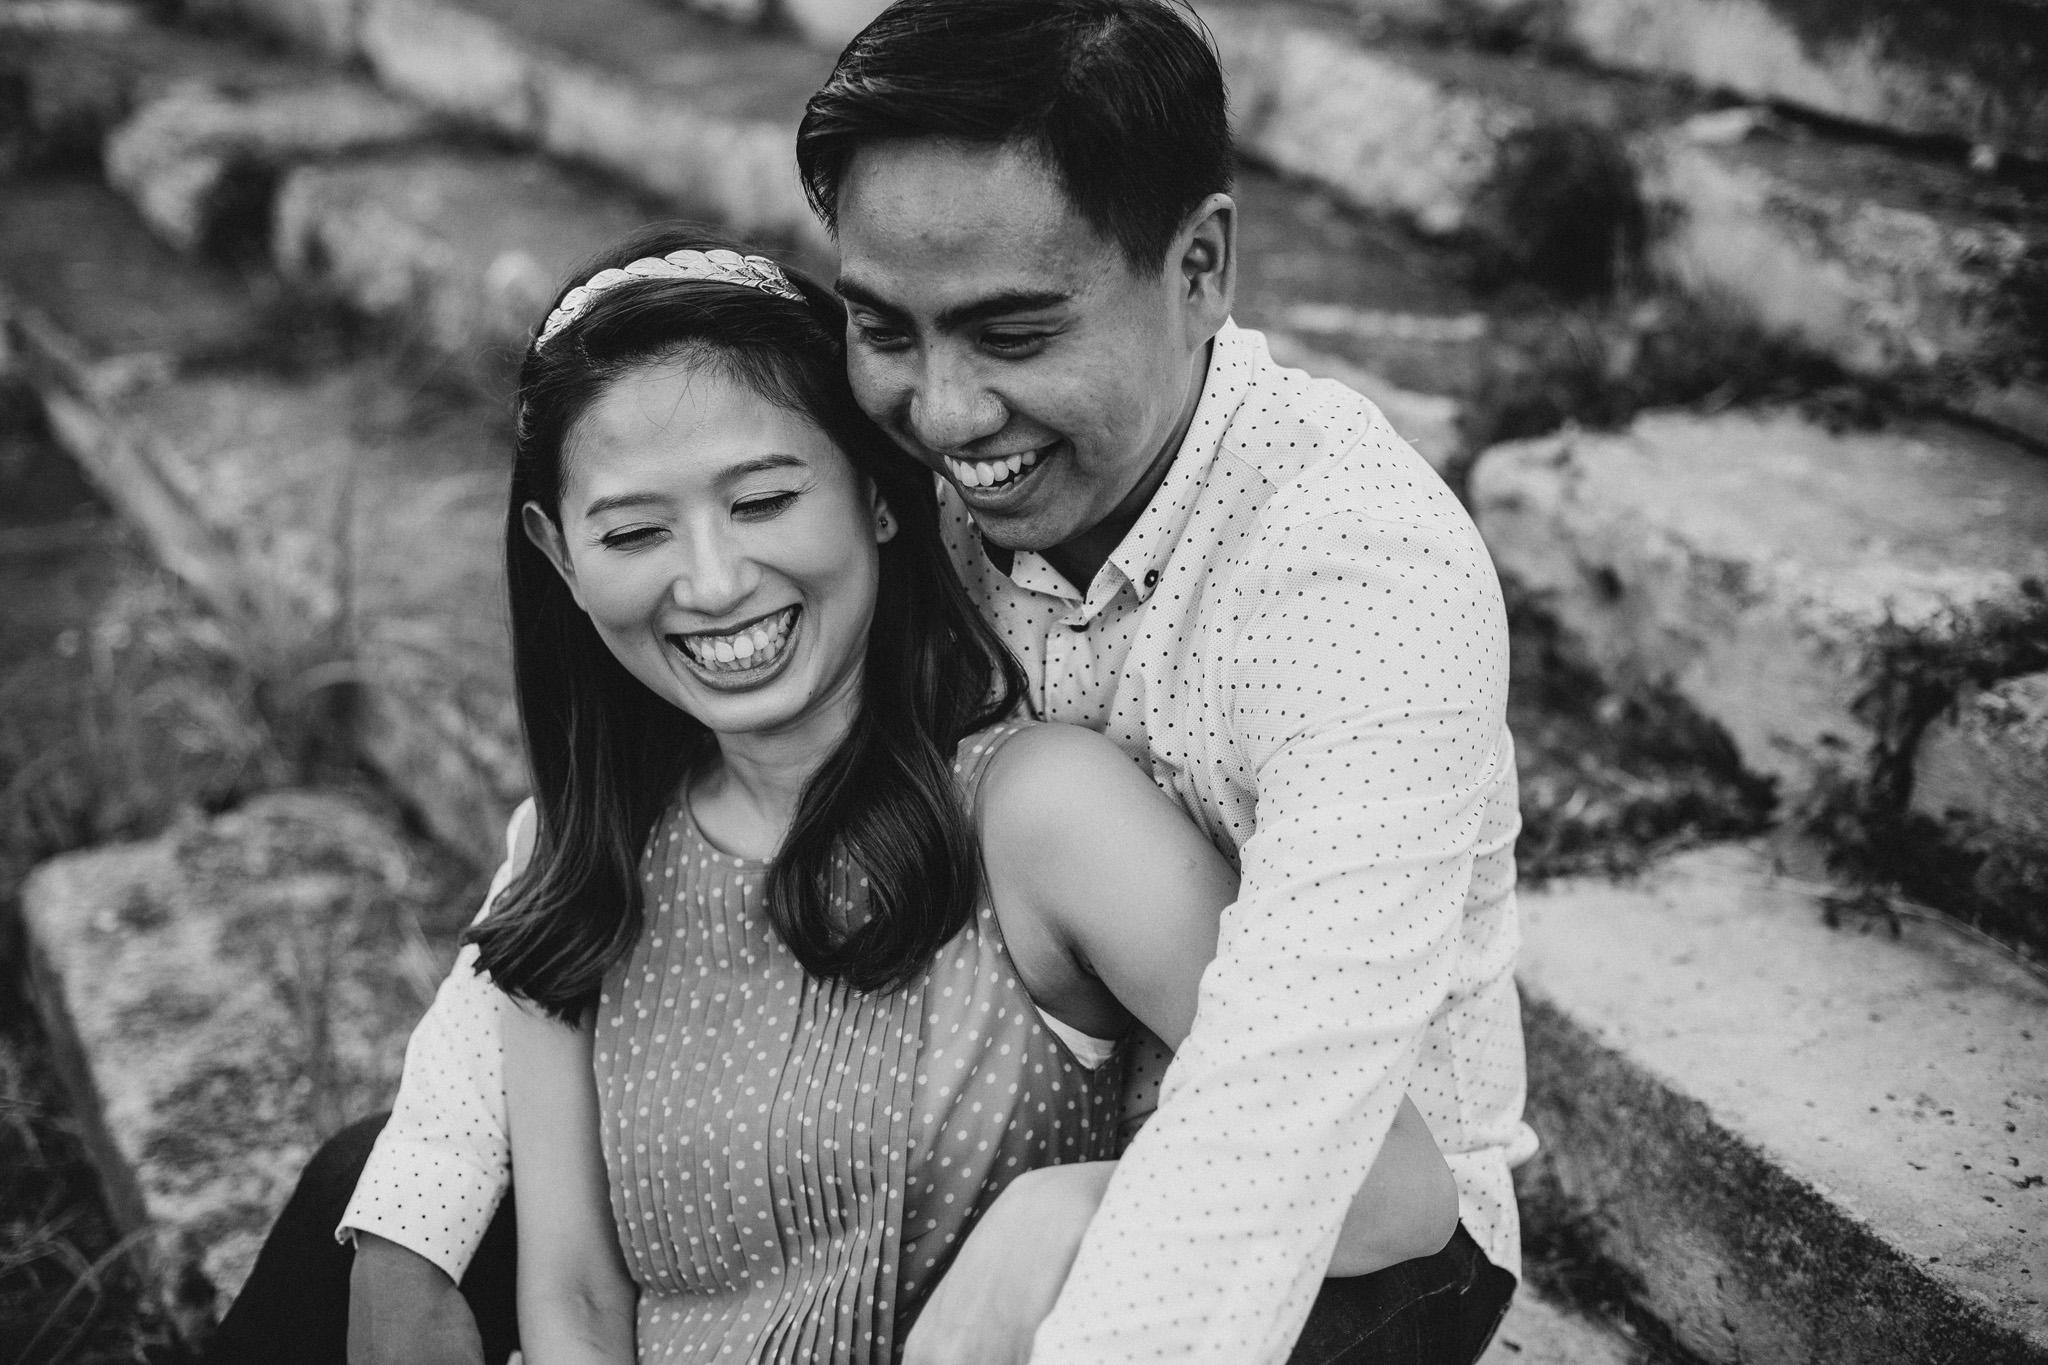 singapore--wedding-photographer-commercial-editorial-travel-wemadethese-firdaus-sasha-sessions-16.jpg